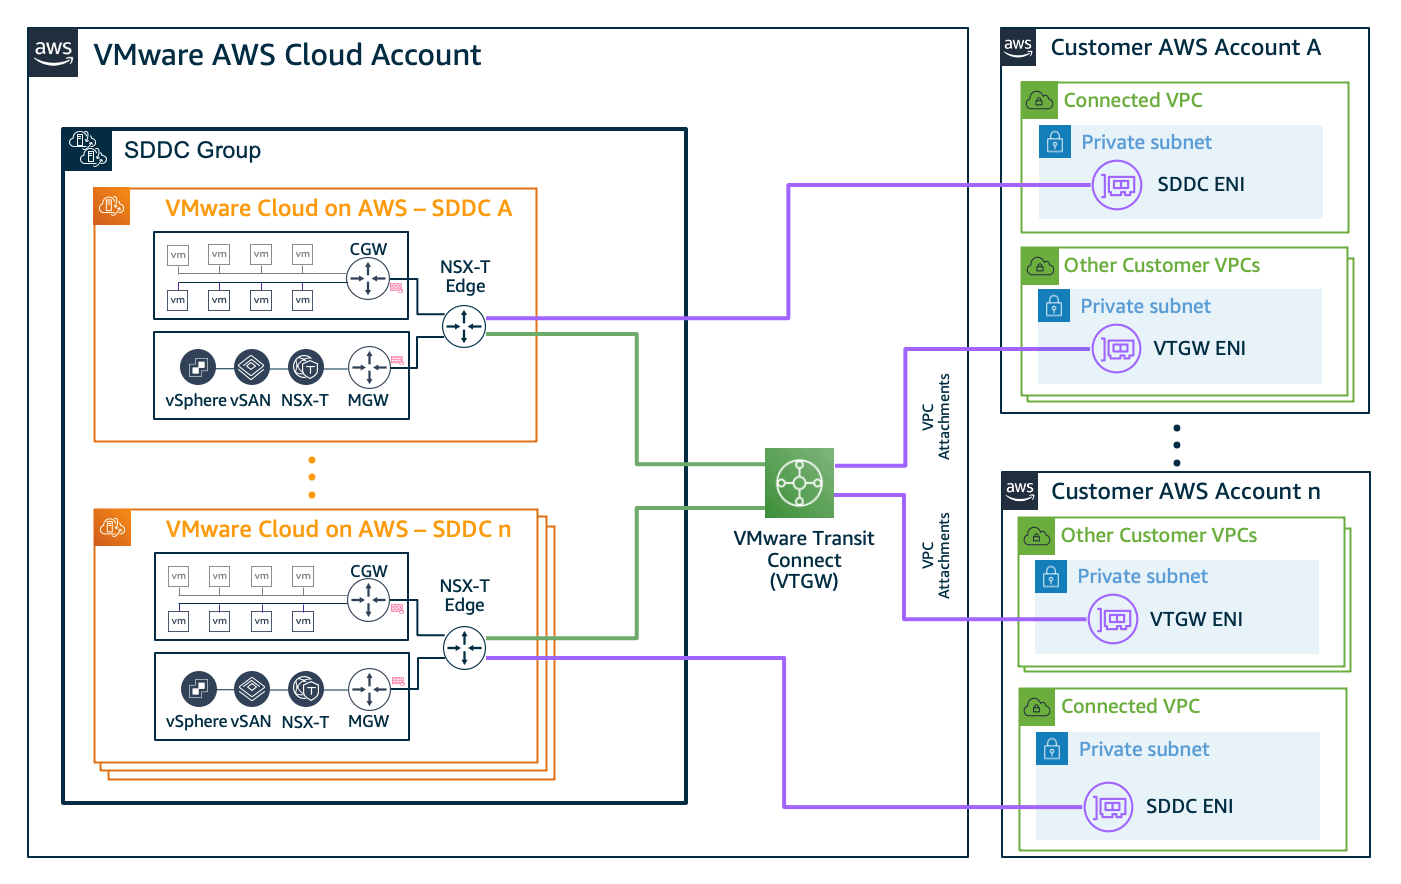 Figure 2. Multi-account VPC connectivity through VMware Transit Connect VPC attachments